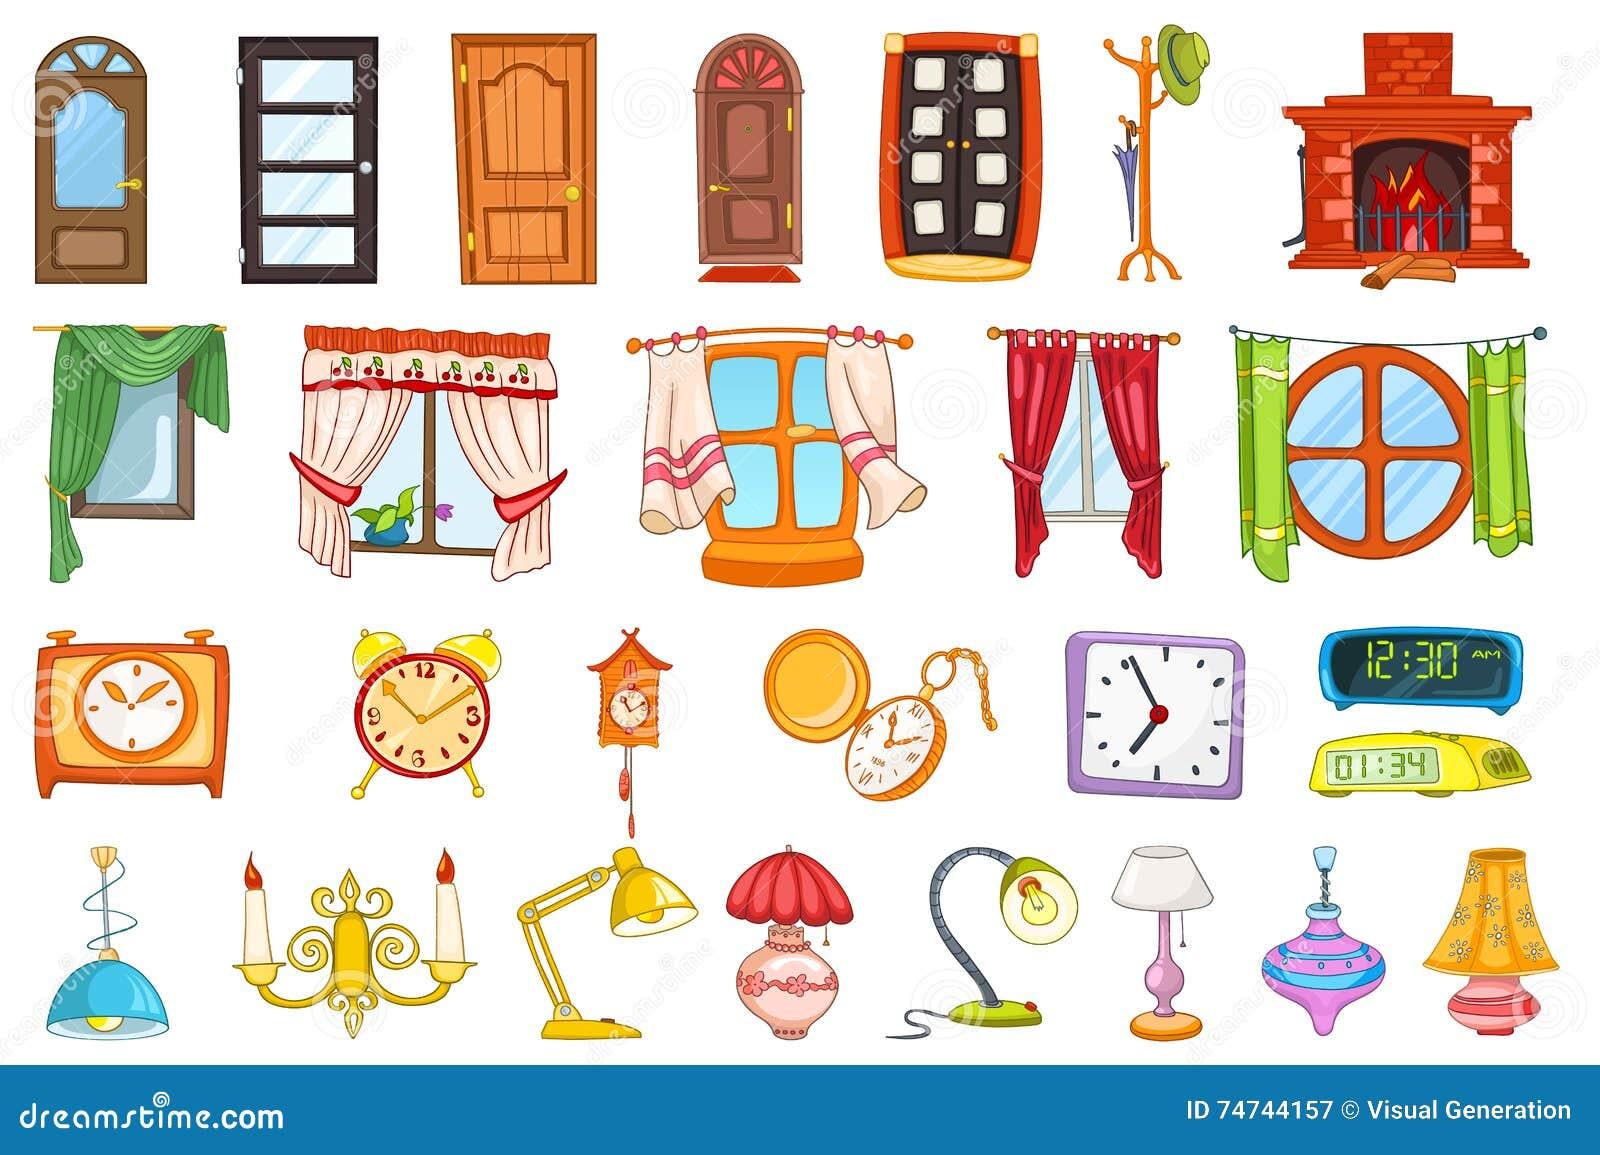 Vector set of house interior objects stock vector for 10 objetos en ingles del salon de clases